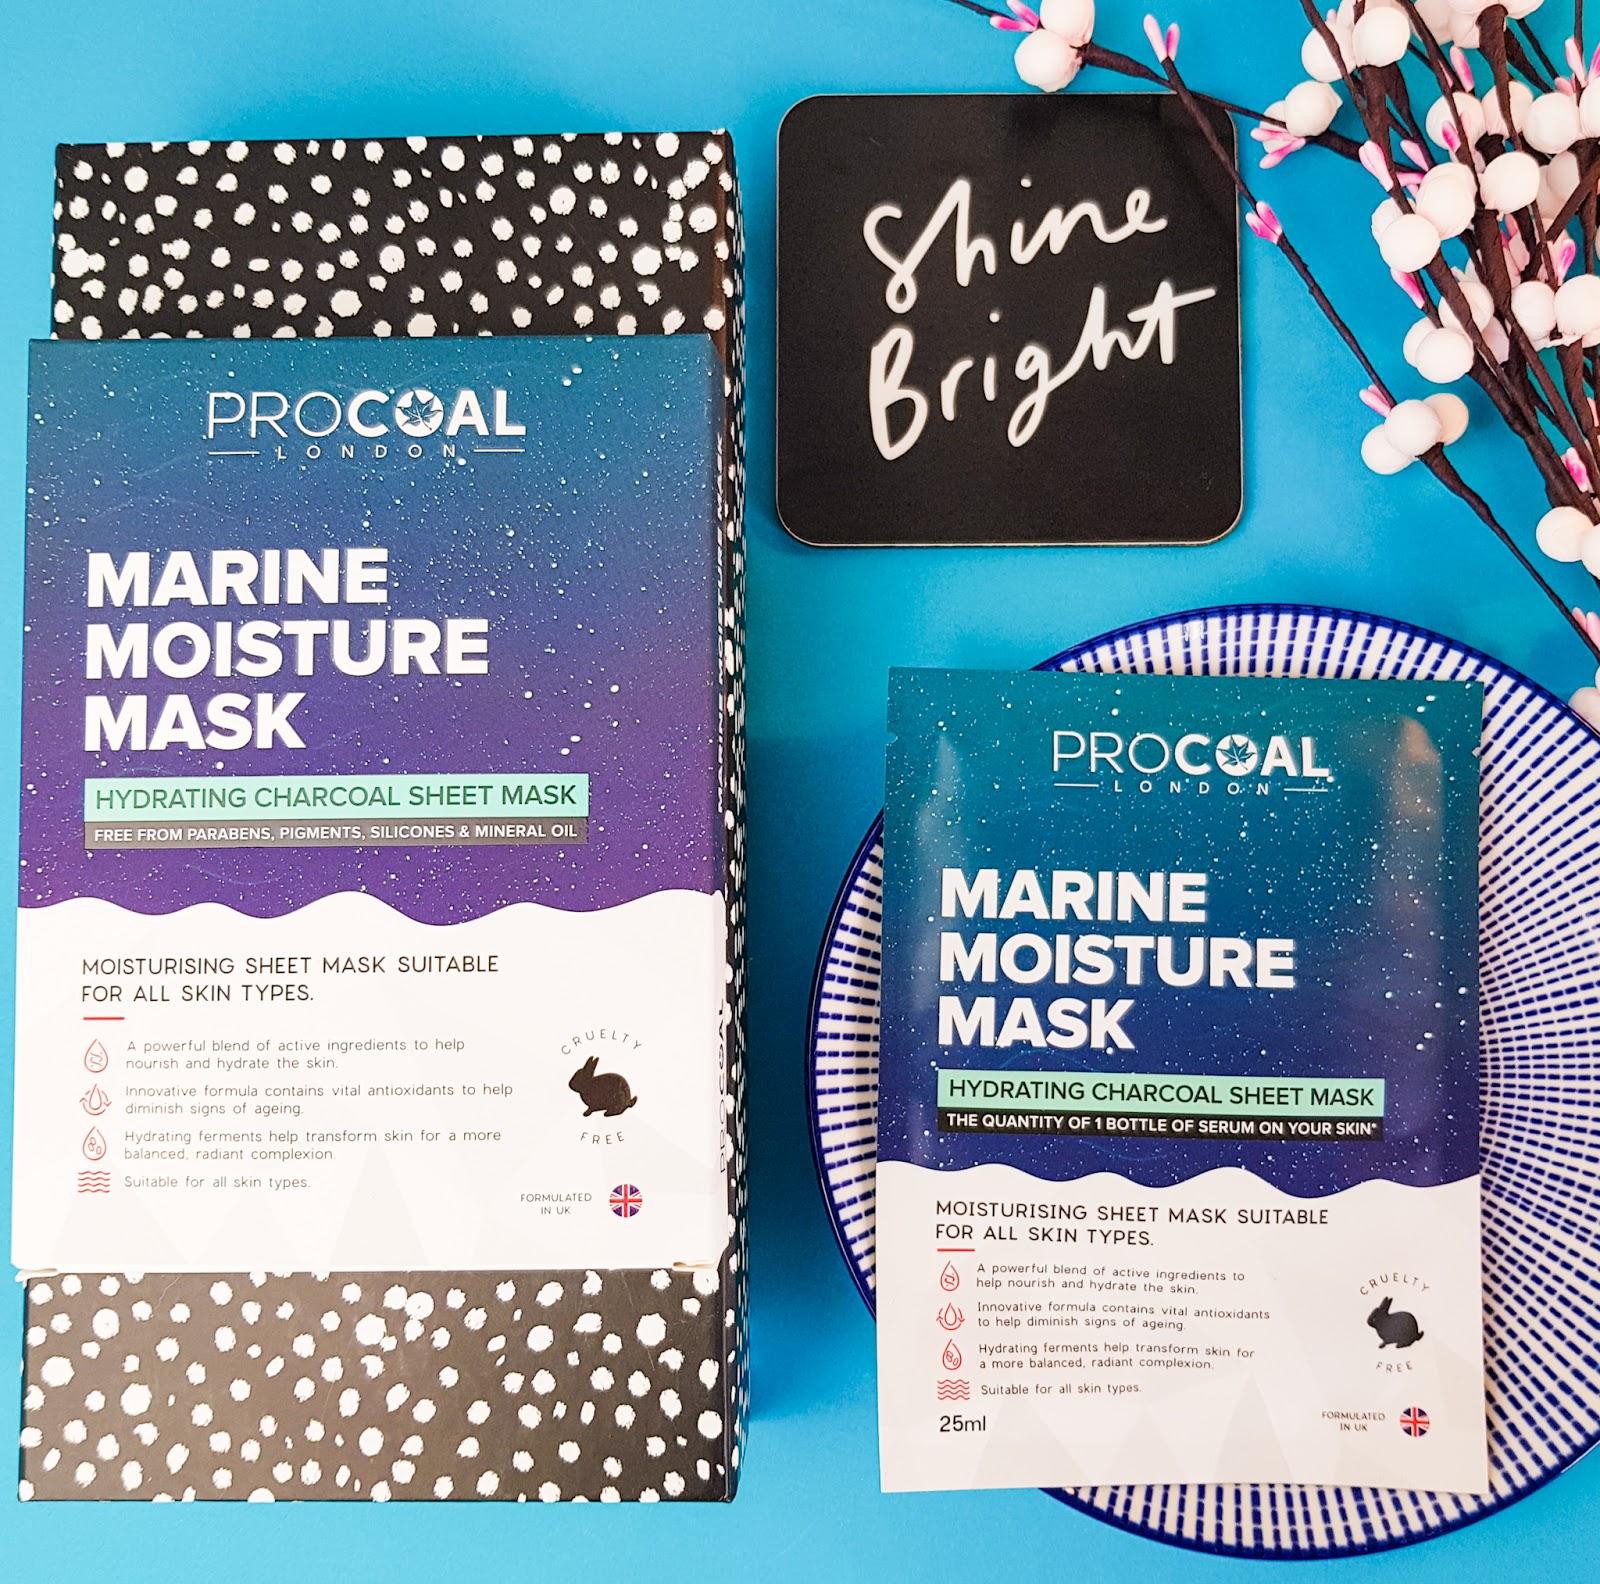 Procoal London Marine Moisture Mask